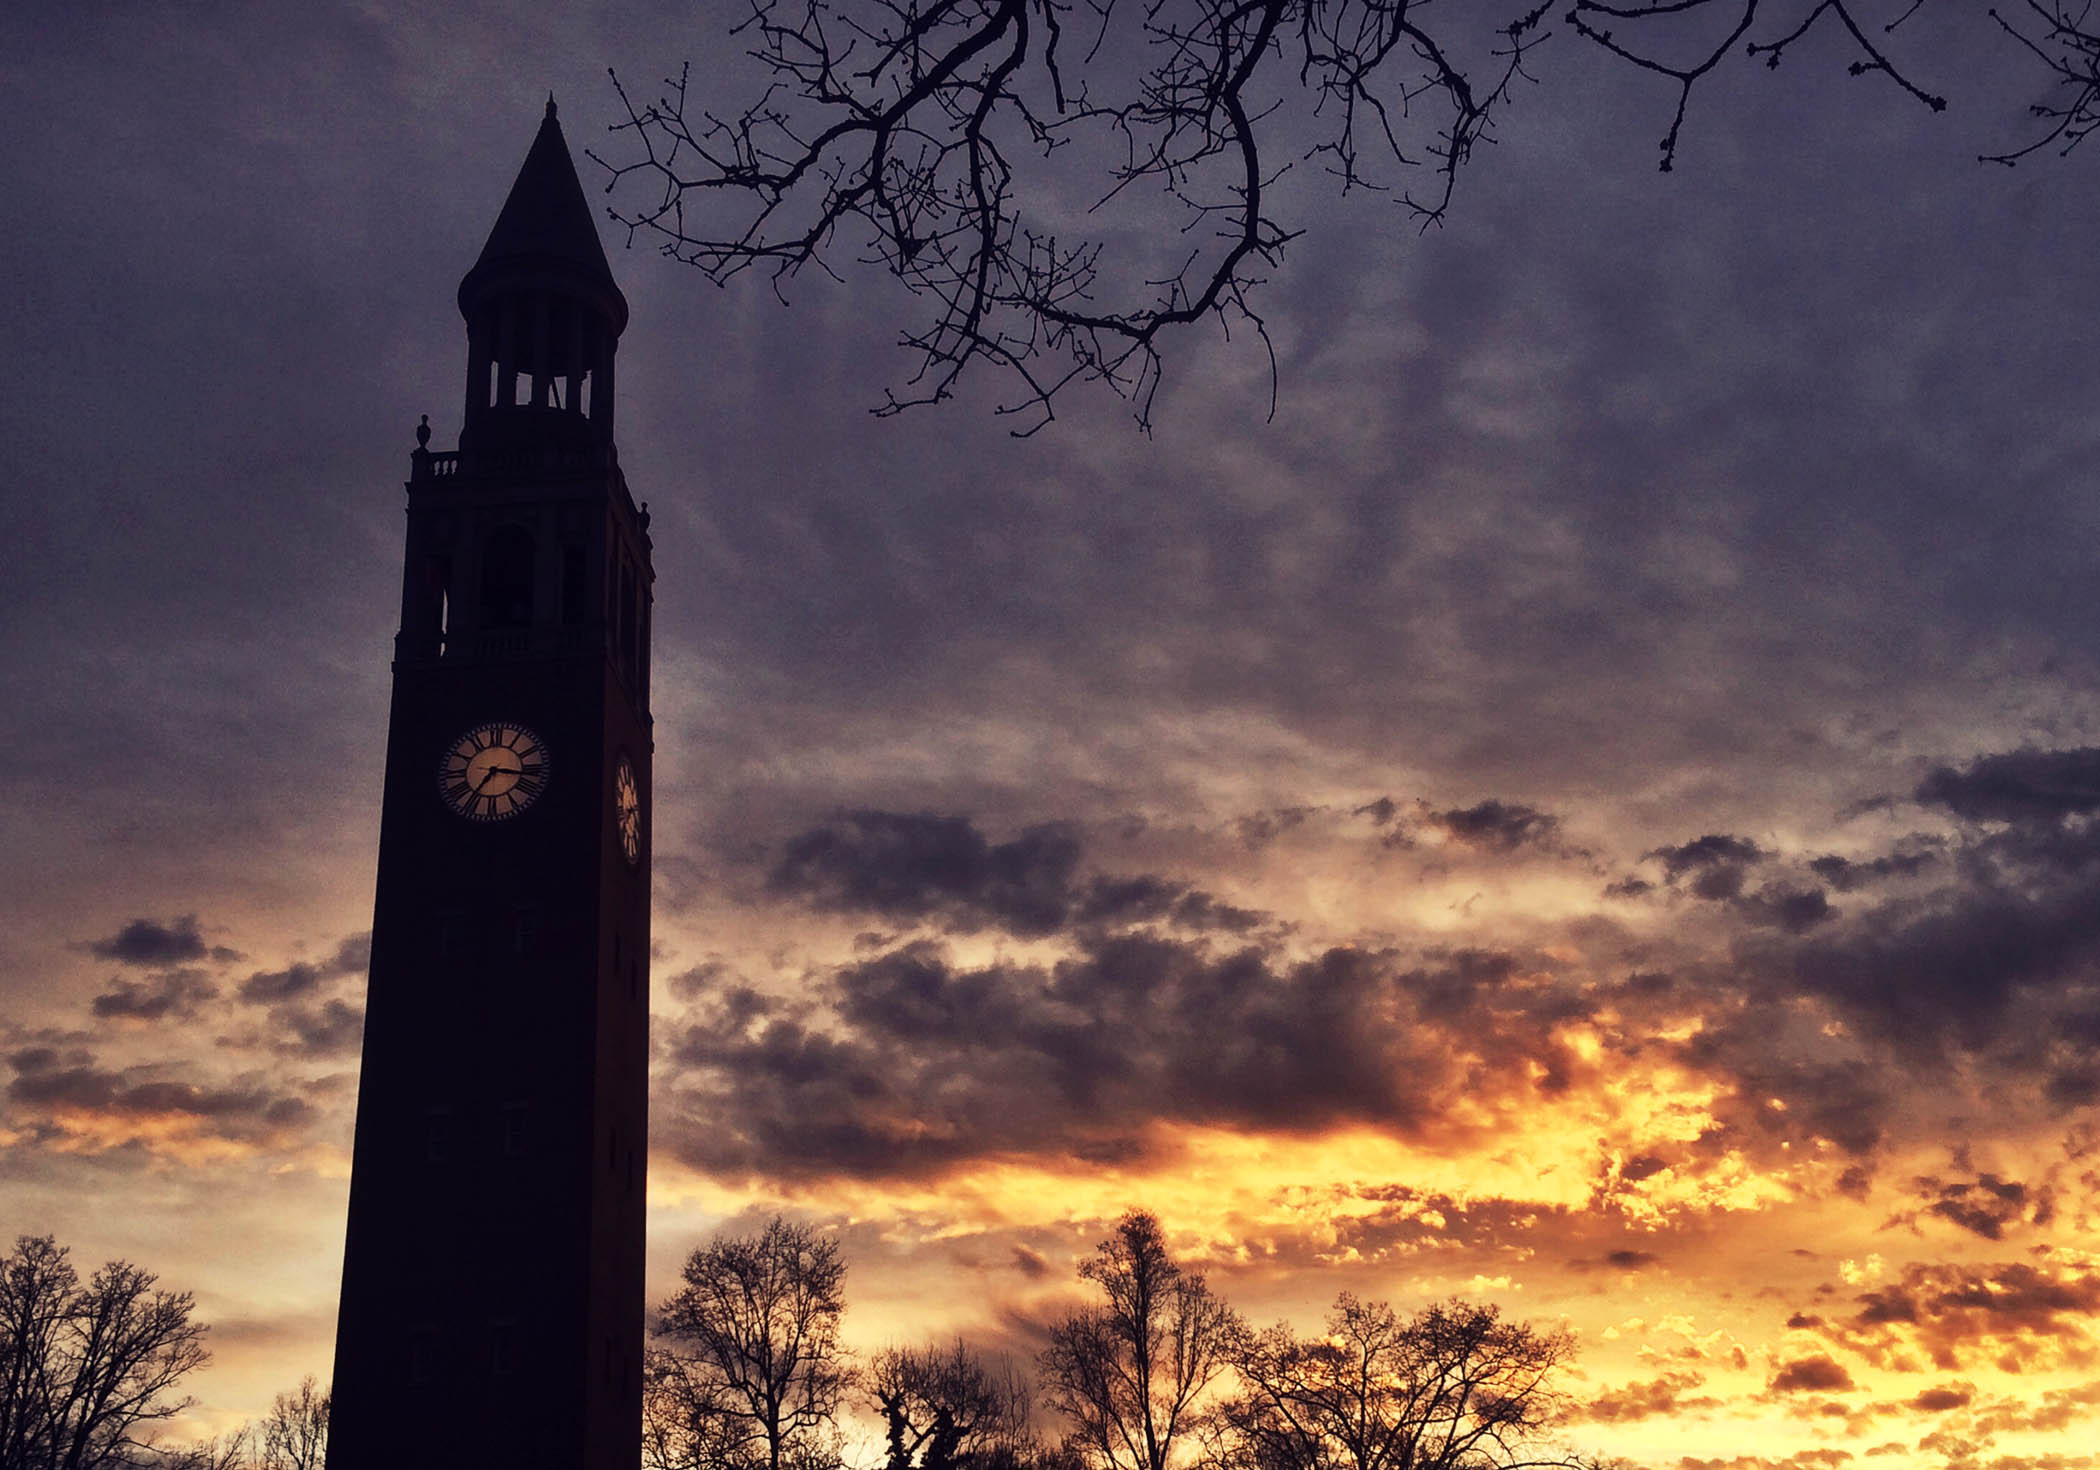 University of north carolina seeks psychology visiting for Psychologie nc 2016